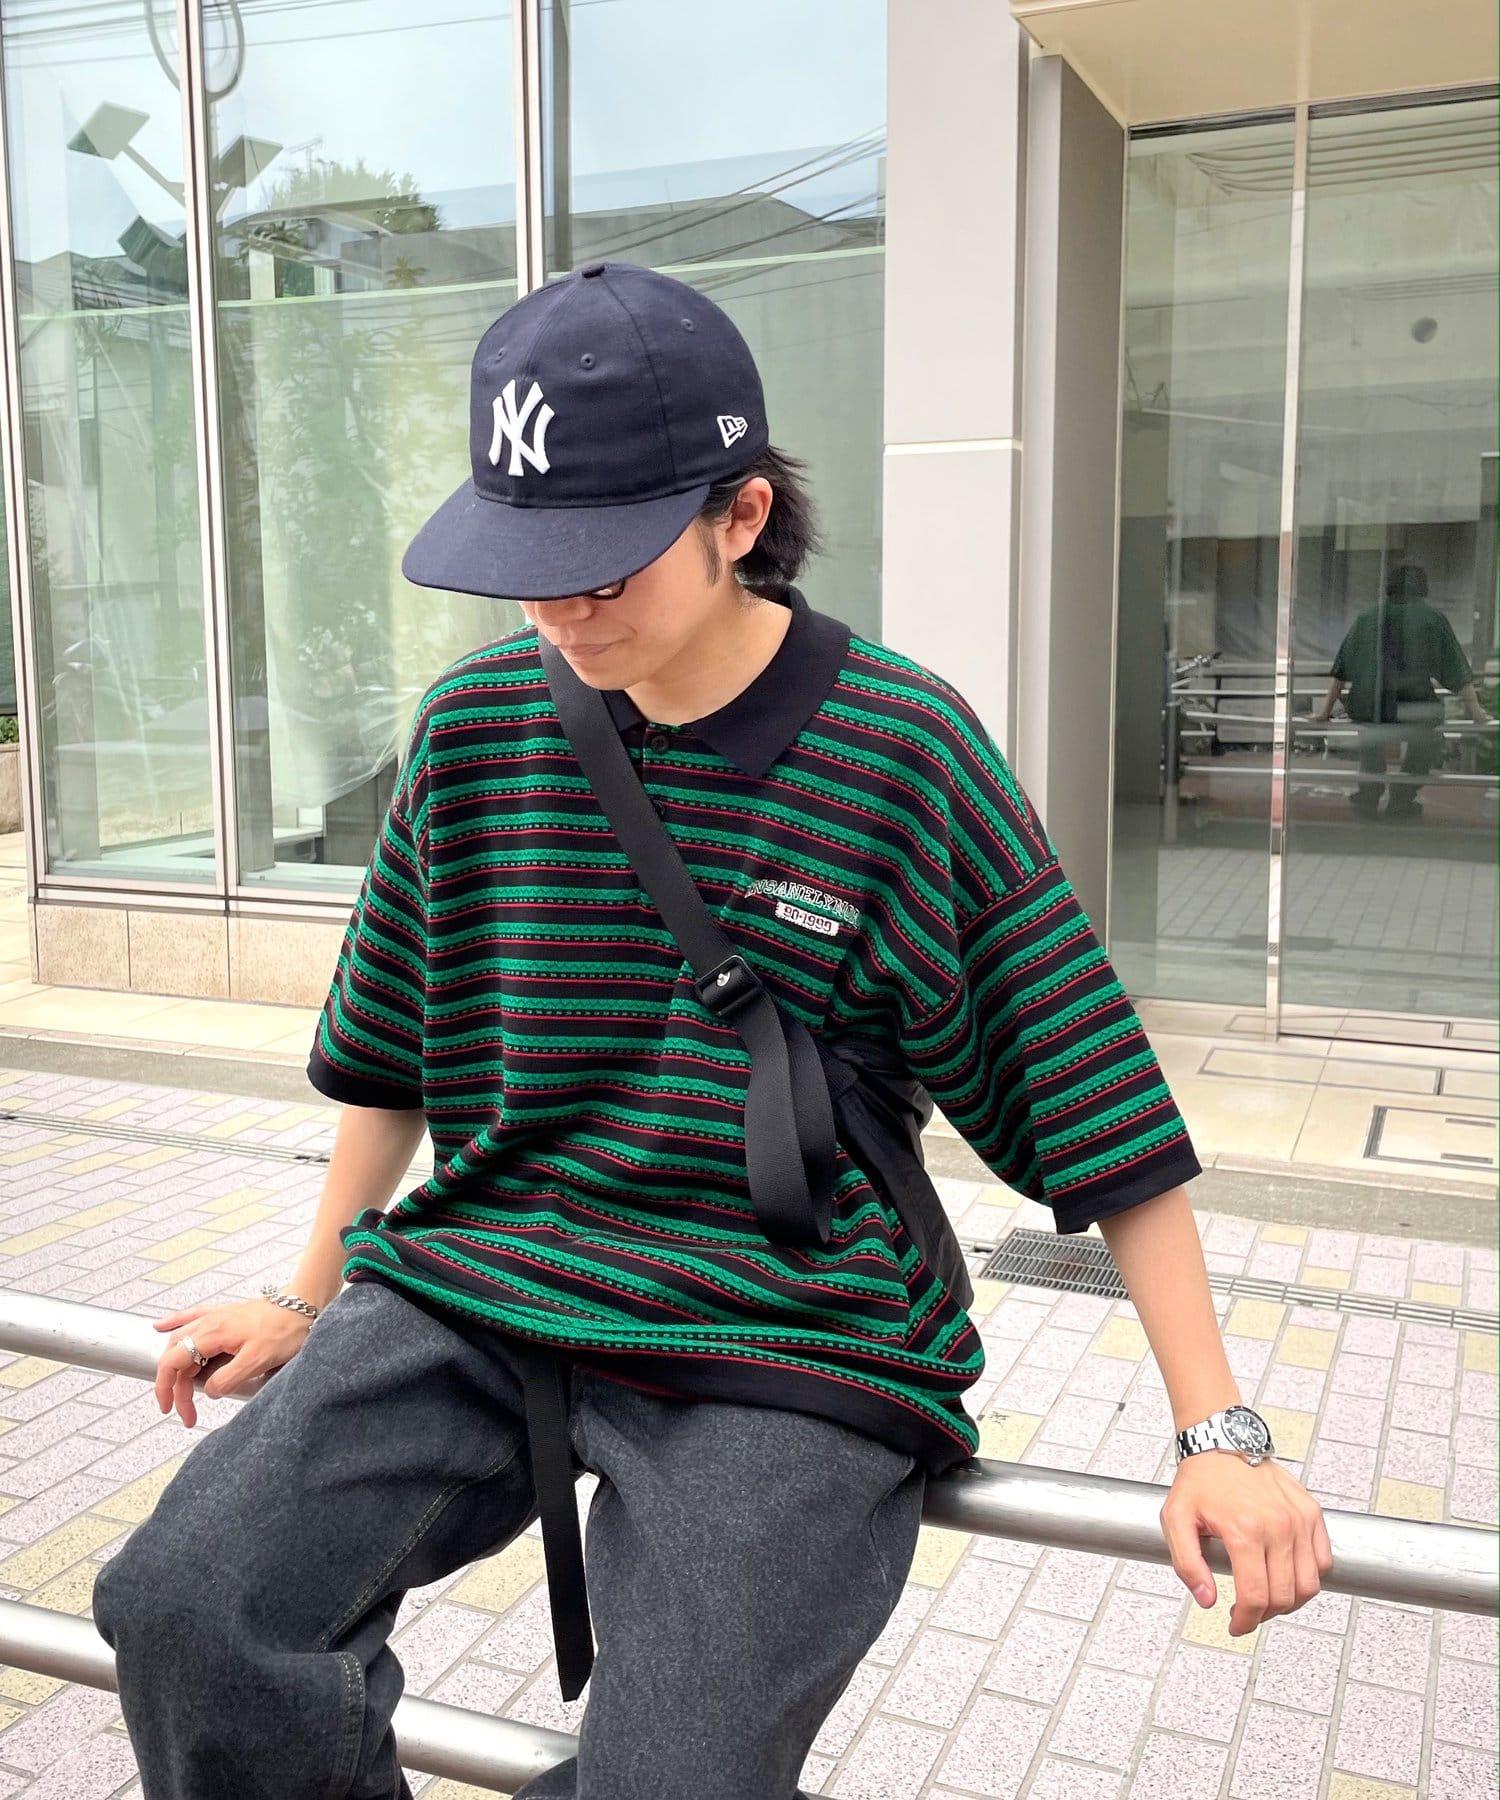 WHO'S WHO gallery(フーズフーギャラリー) 【KOOKY'N/クーキー】ジャガードボーダーニットポロ